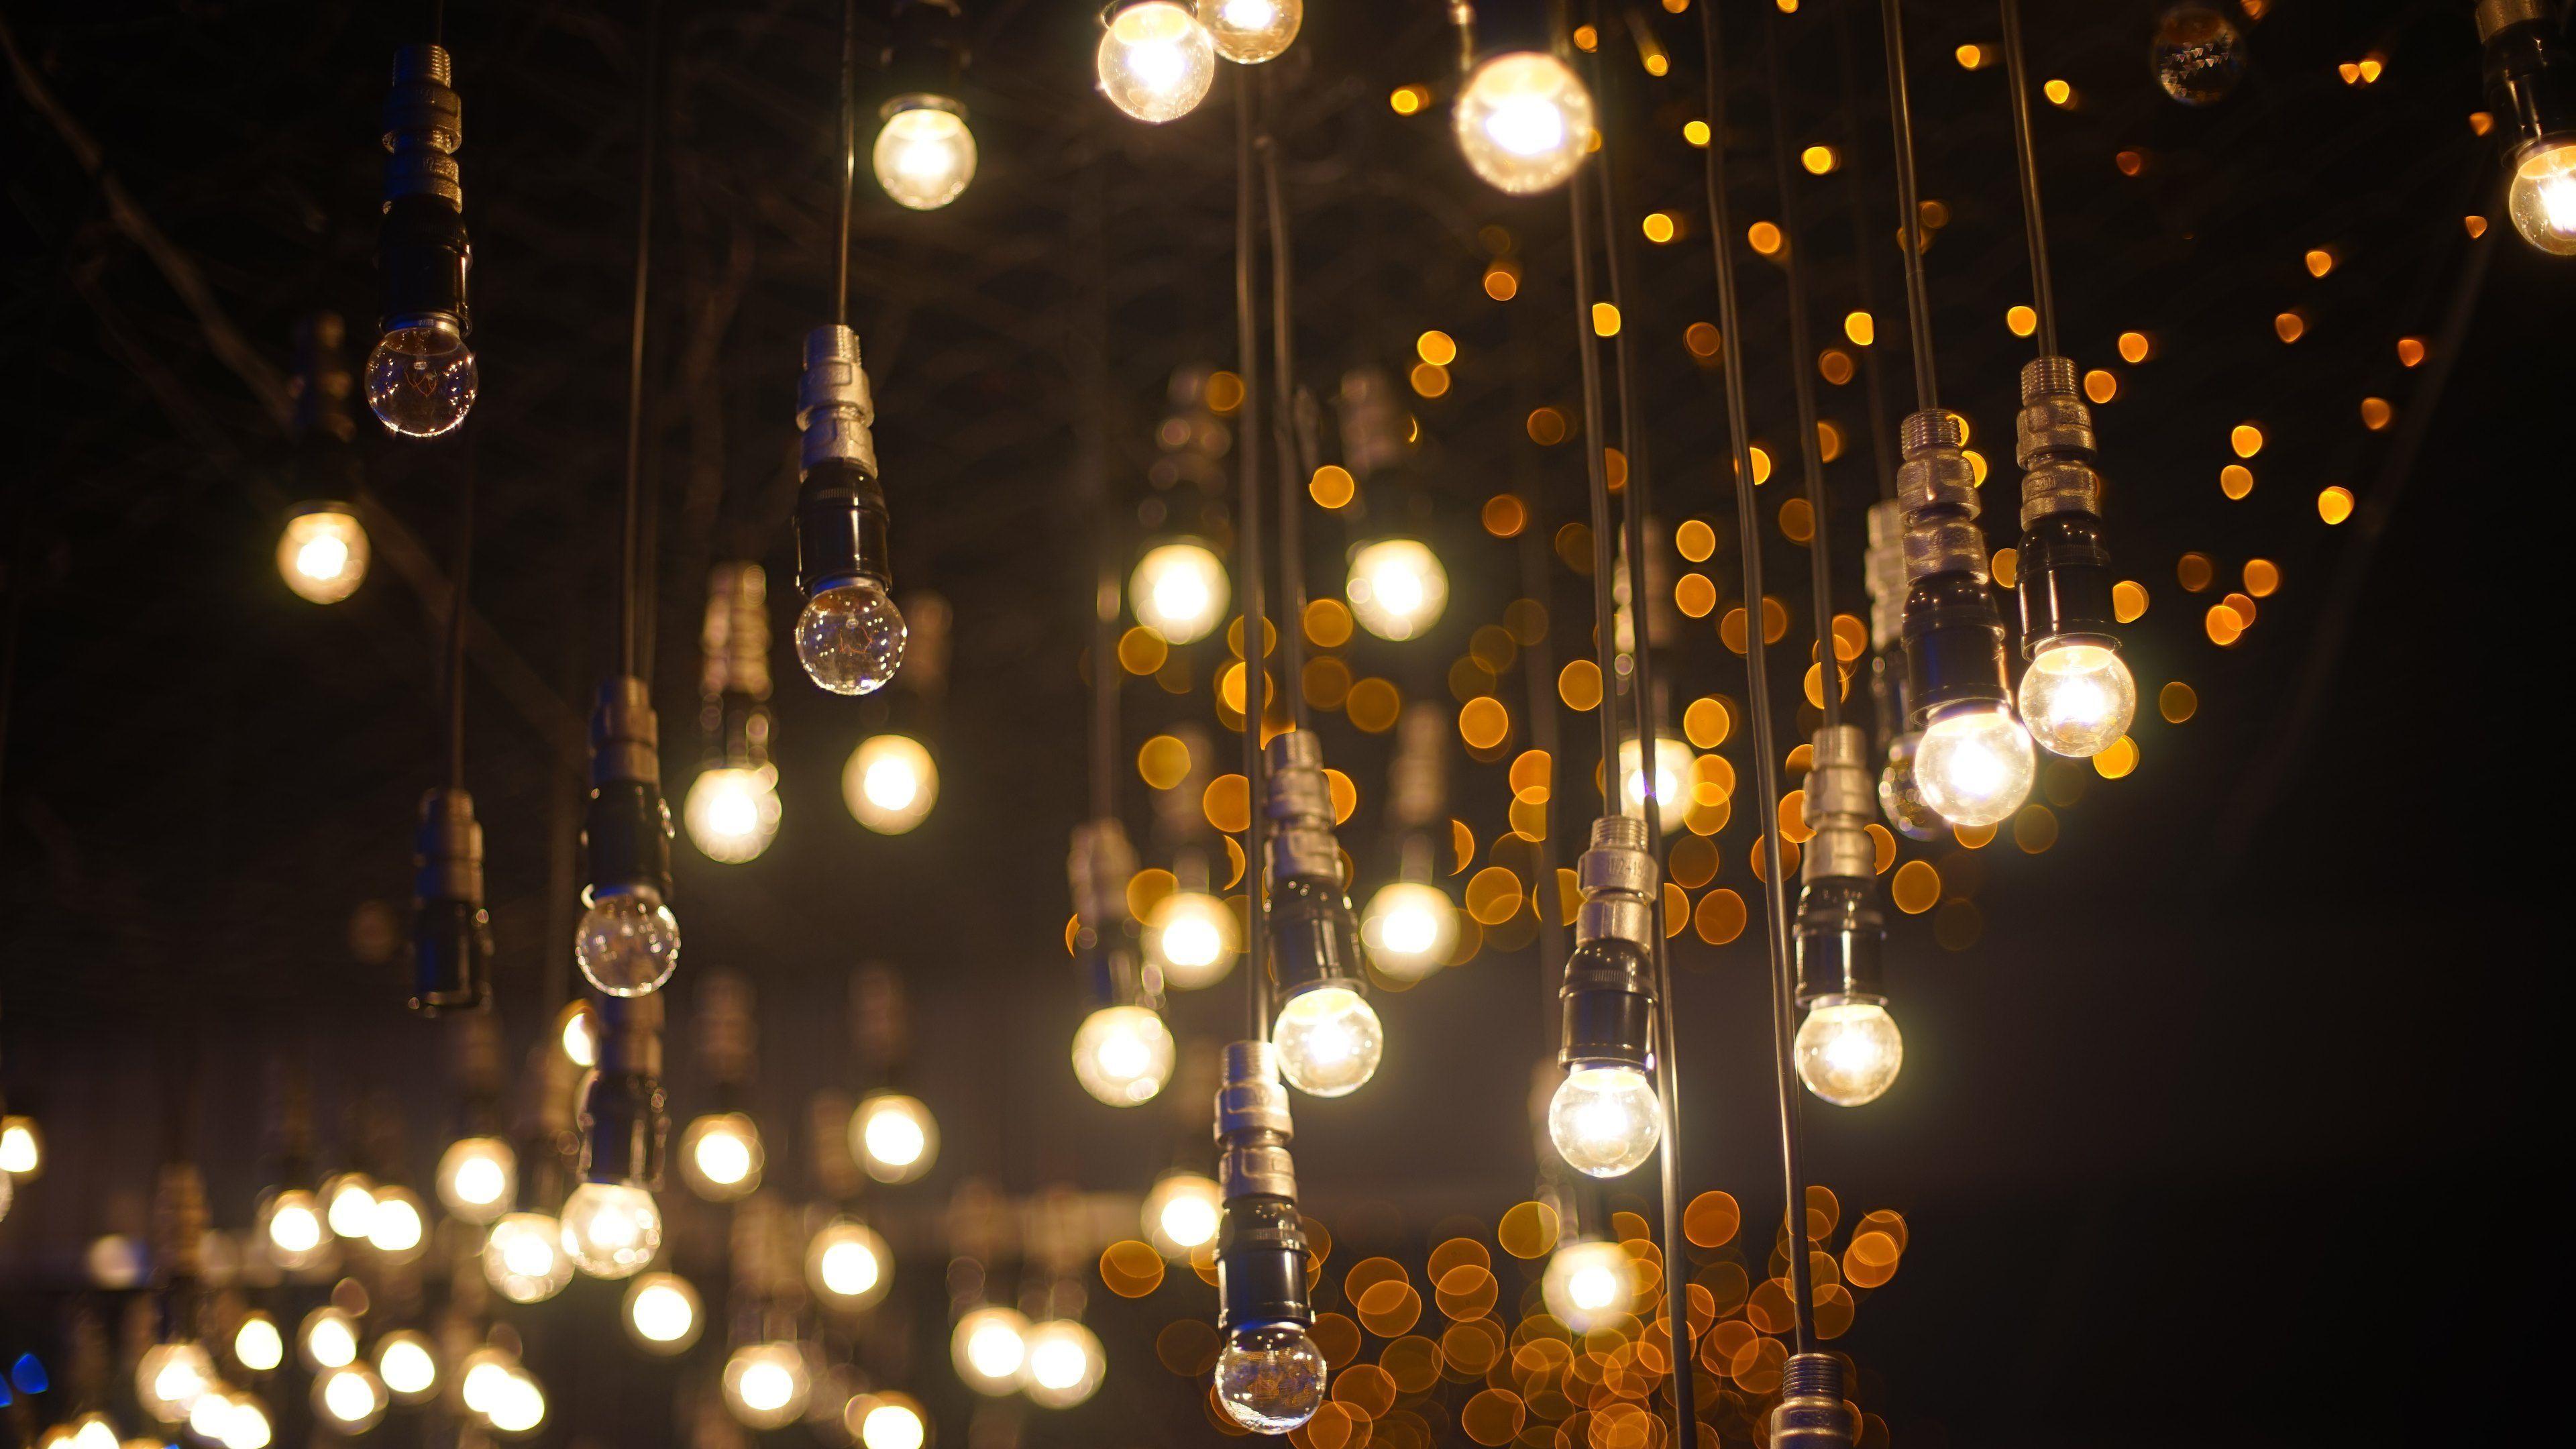 Light Bulbs Aesthetic Orice Images, Photos, Reviews